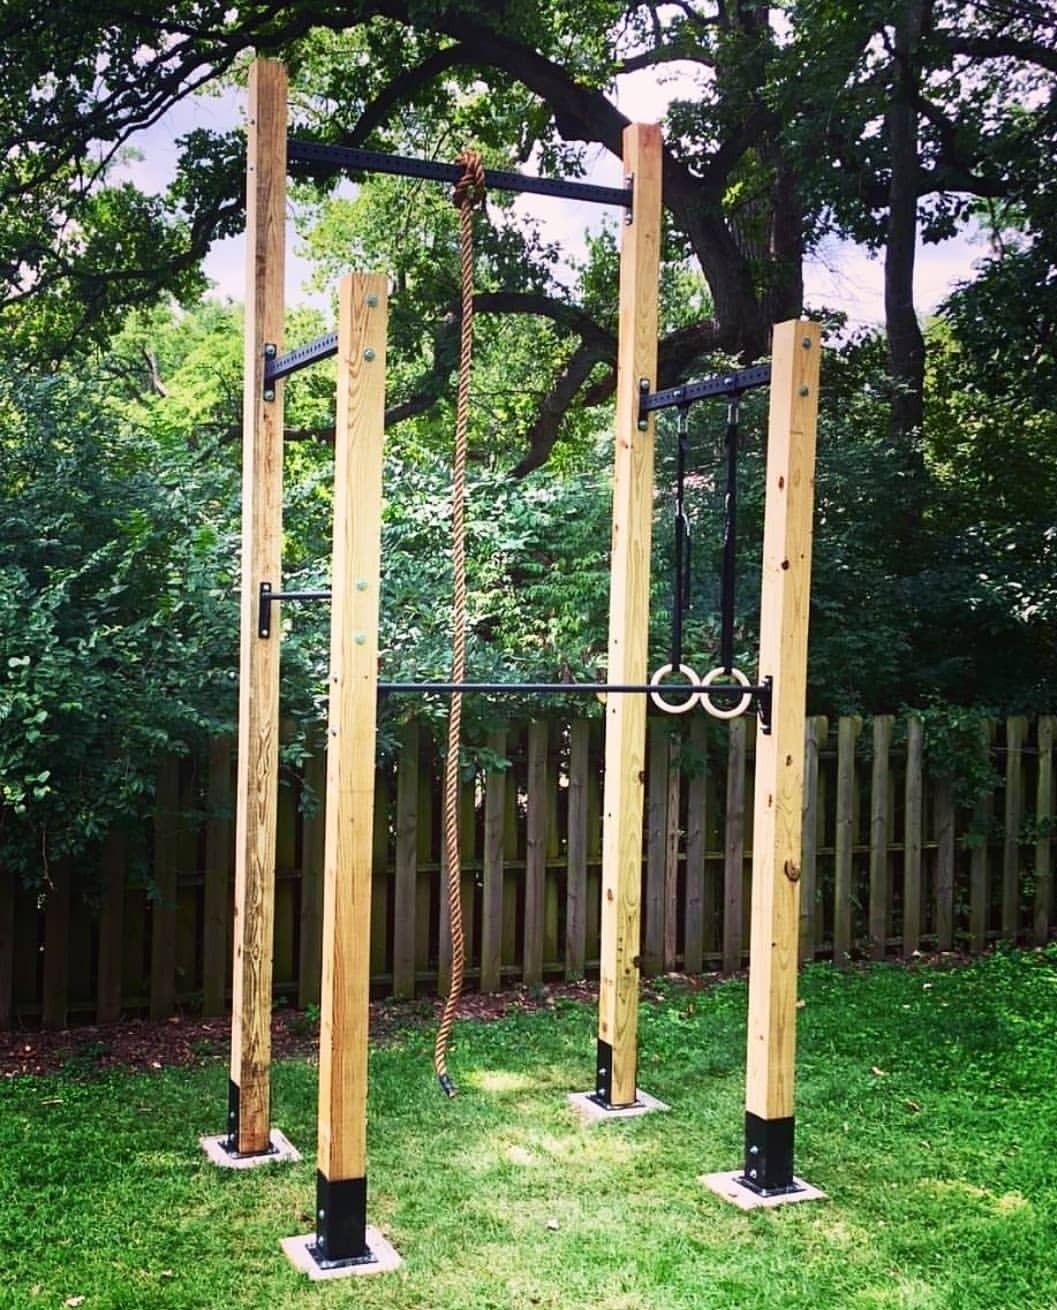 Pin On Kinder Aussengelande Backyard diy gymnastics bar